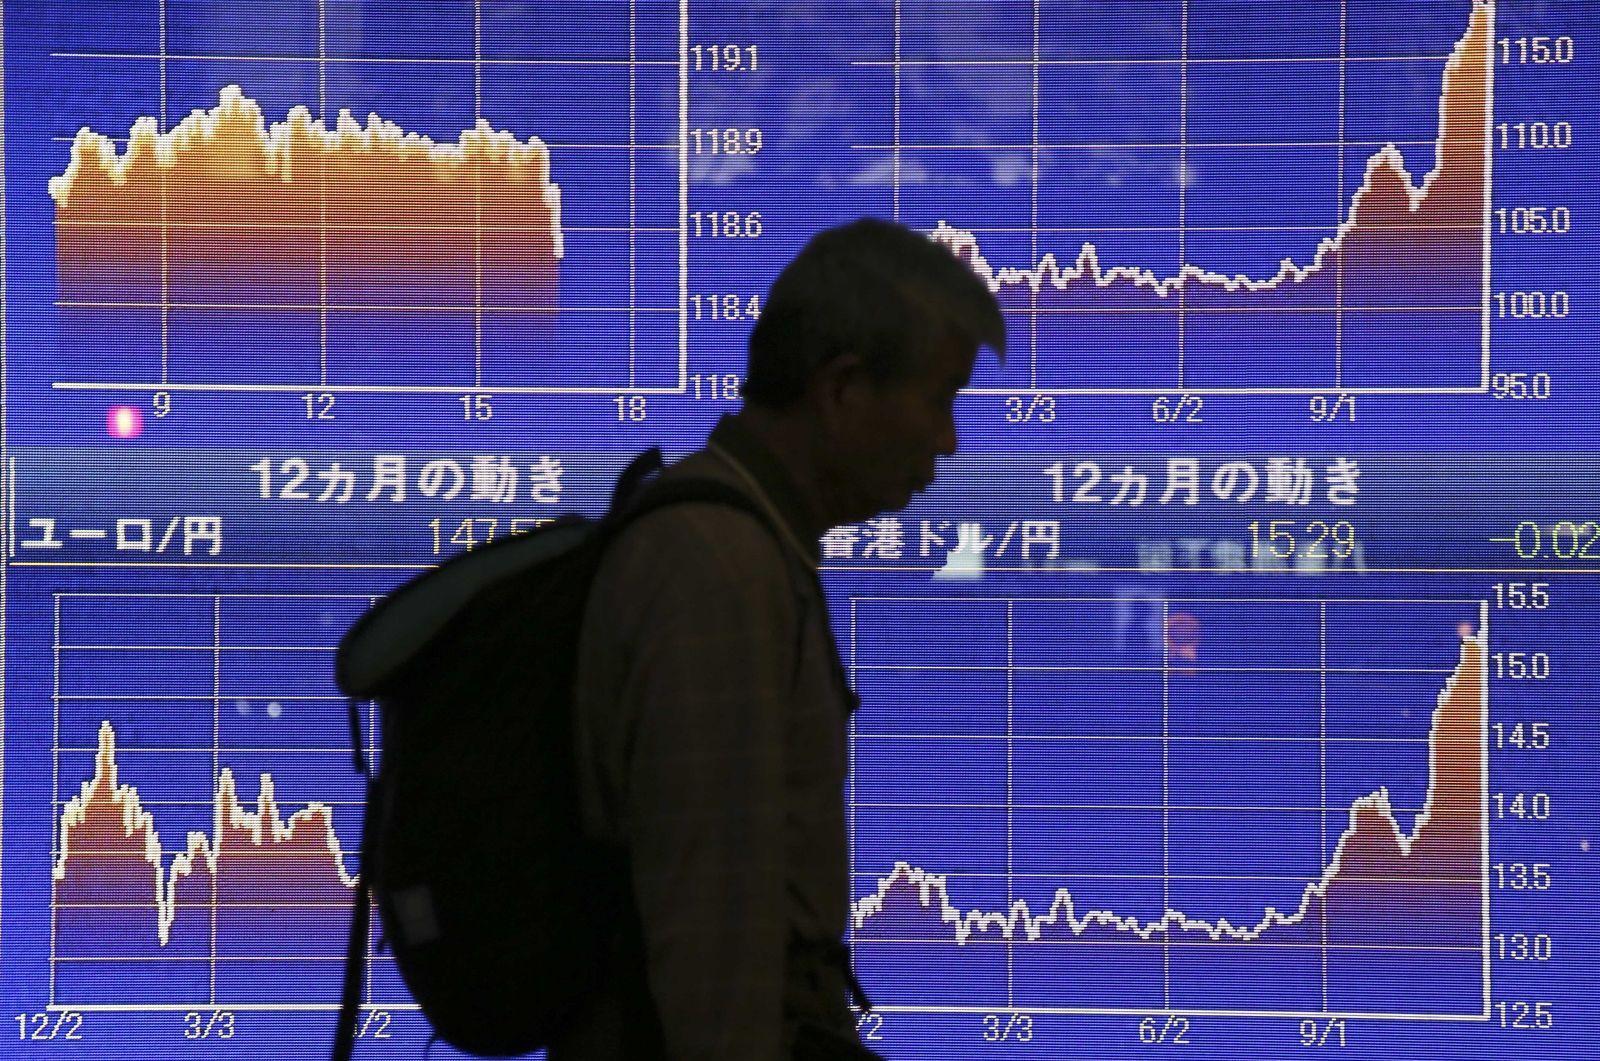 Japan Finanzmarkt